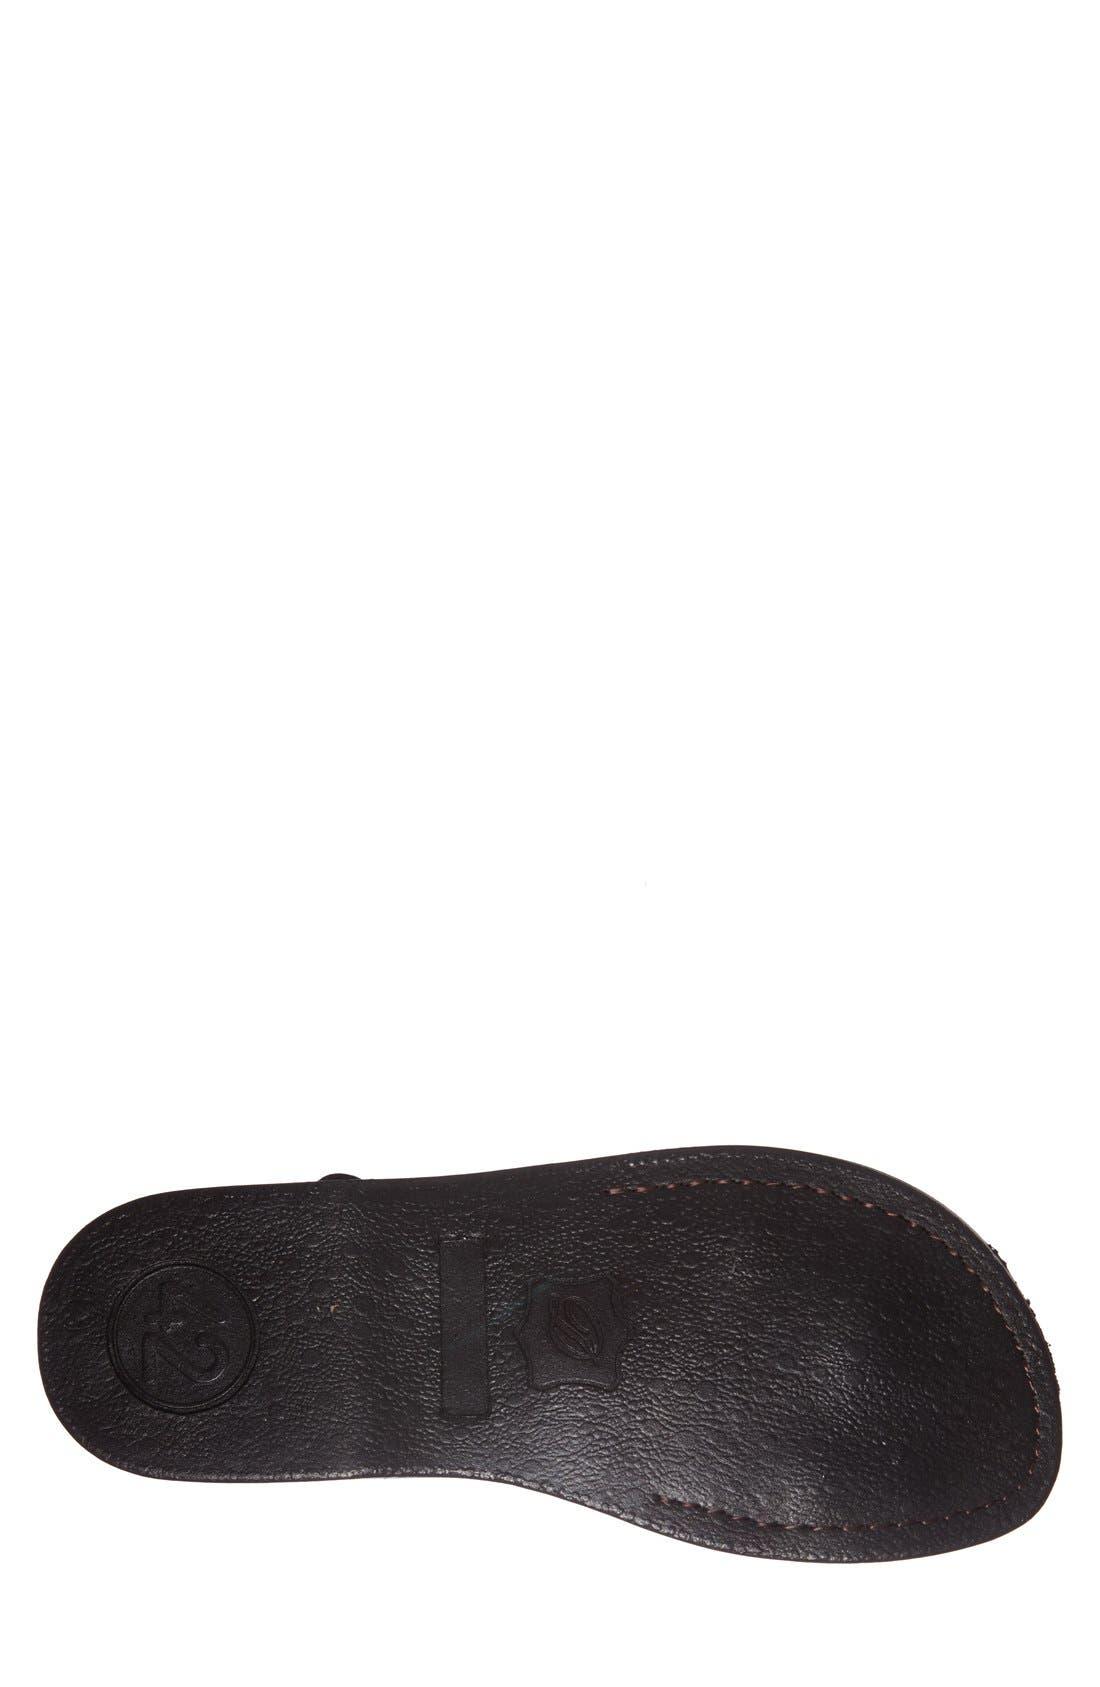 'The Good Shepherd' Leather Sandal,                             Alternate thumbnail 3, color,                             BLACK